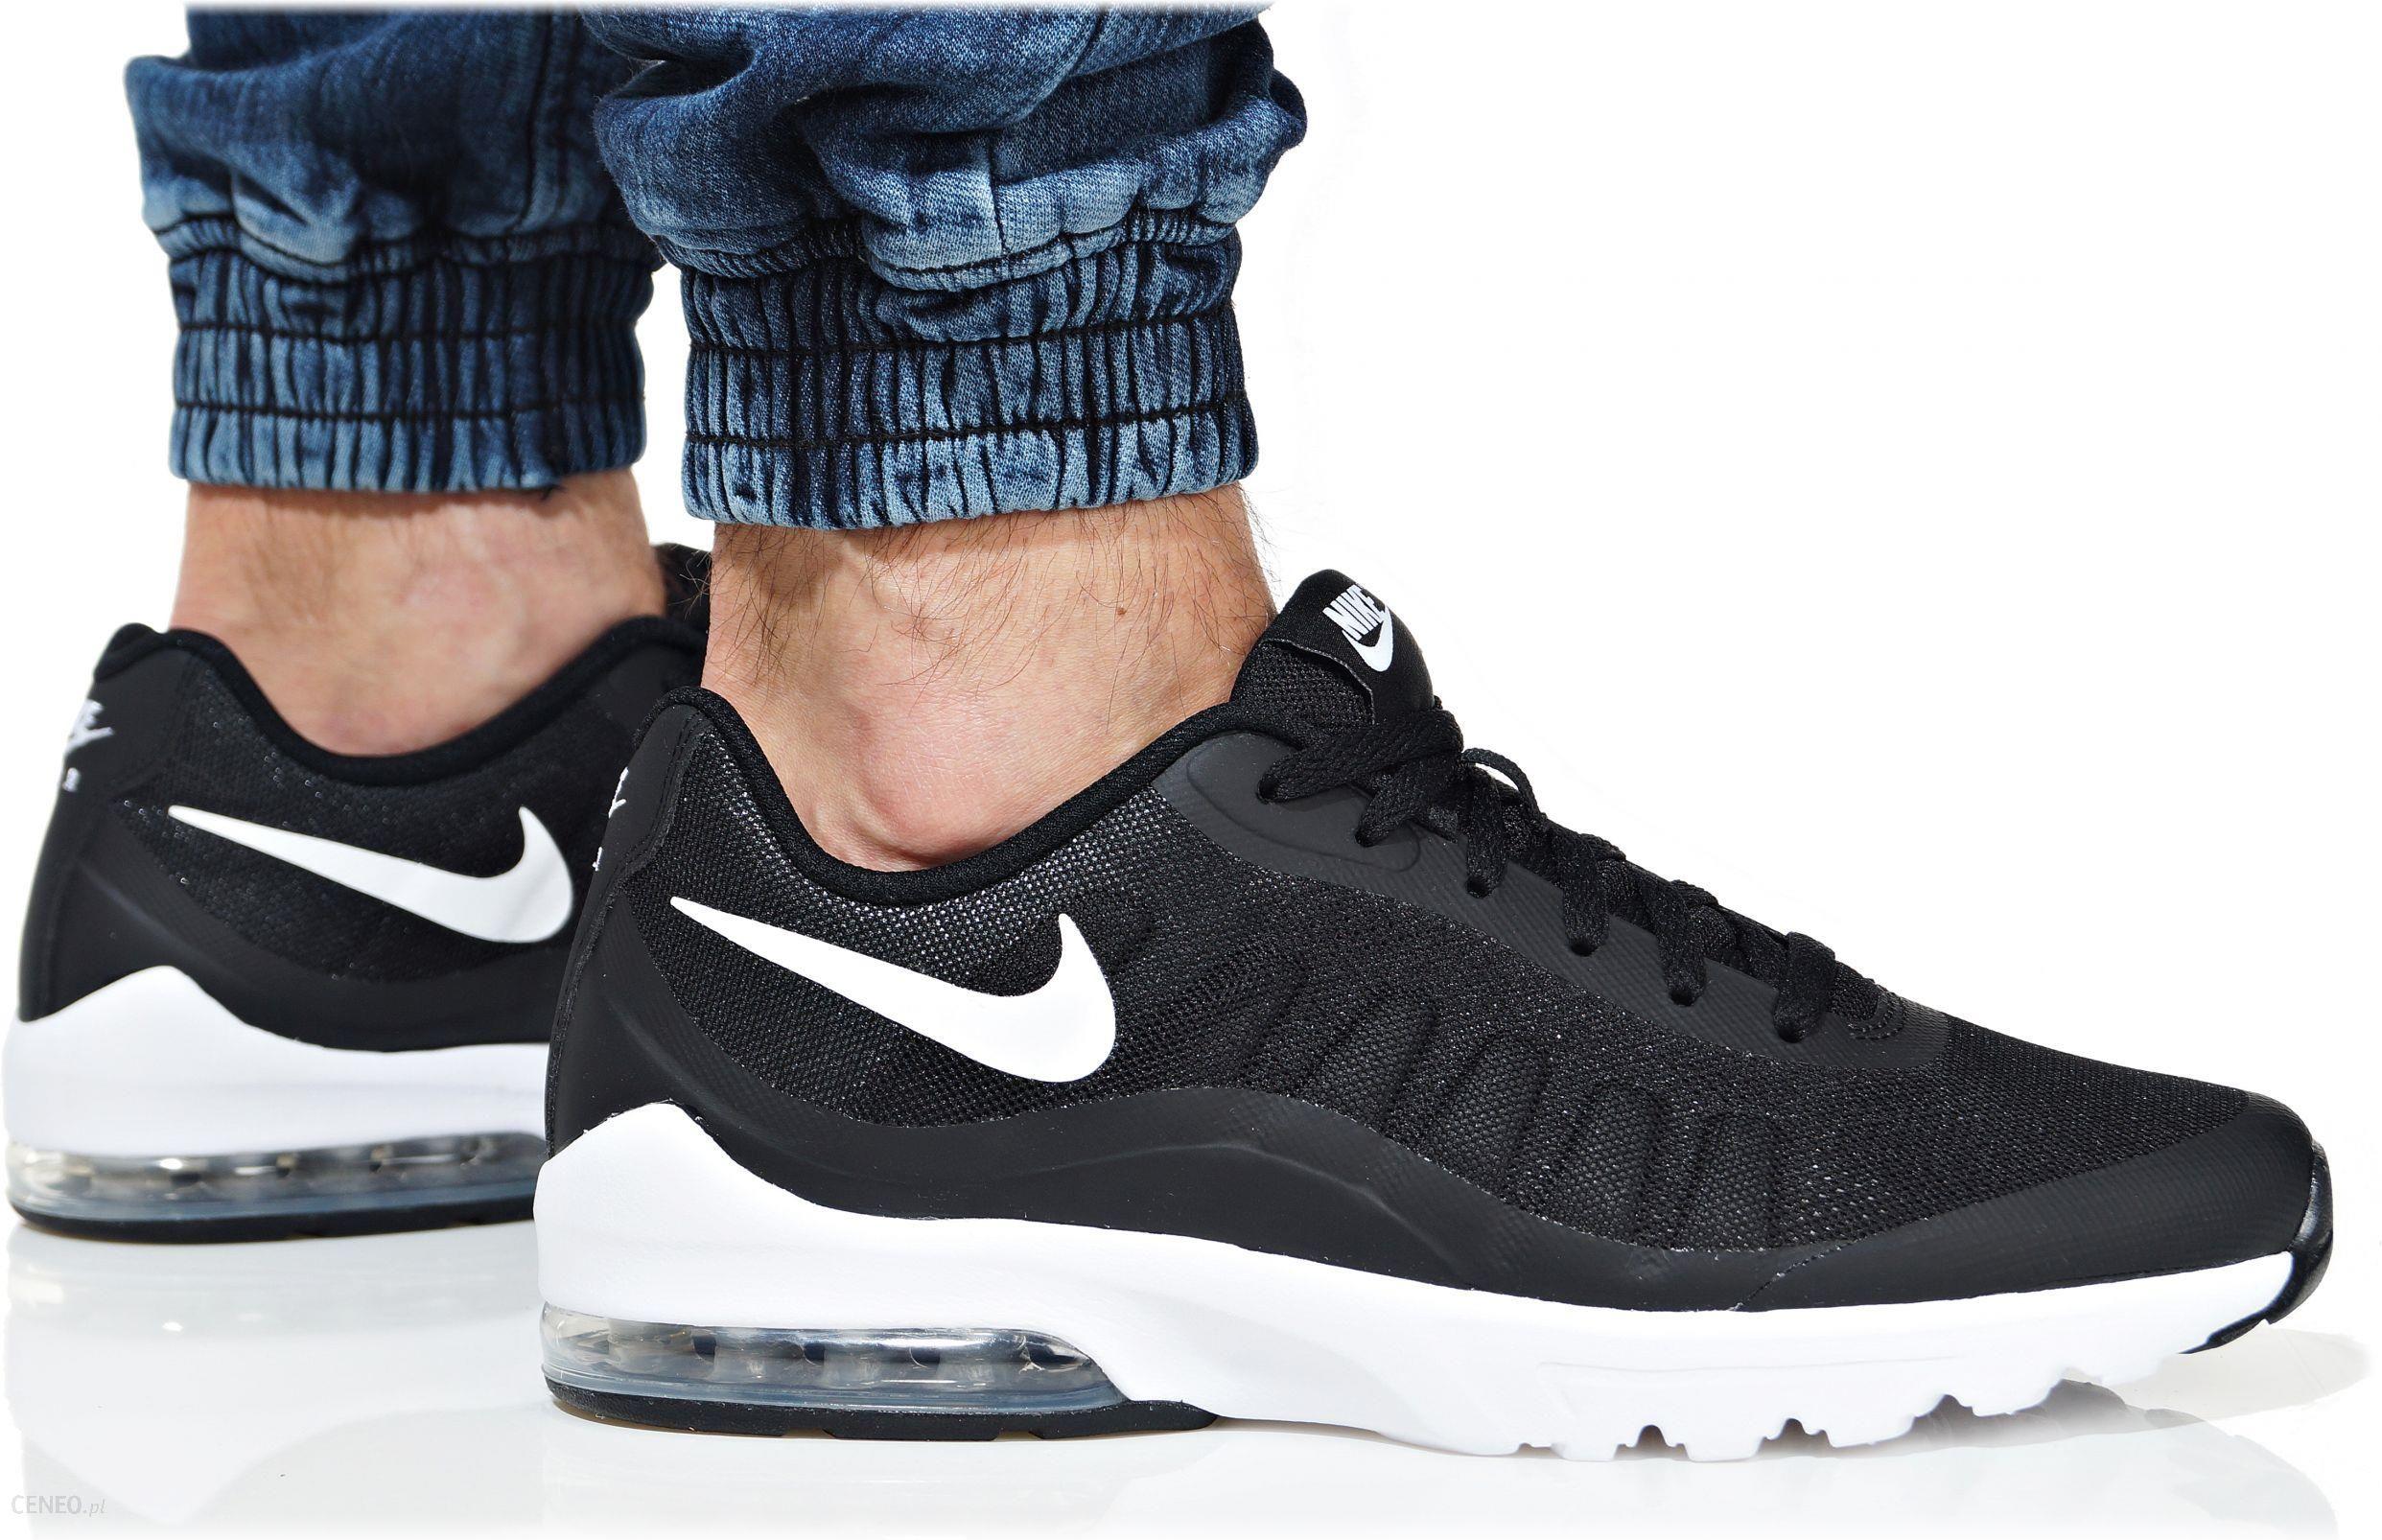 Nike Air Max Invigor 749680 010 czarny